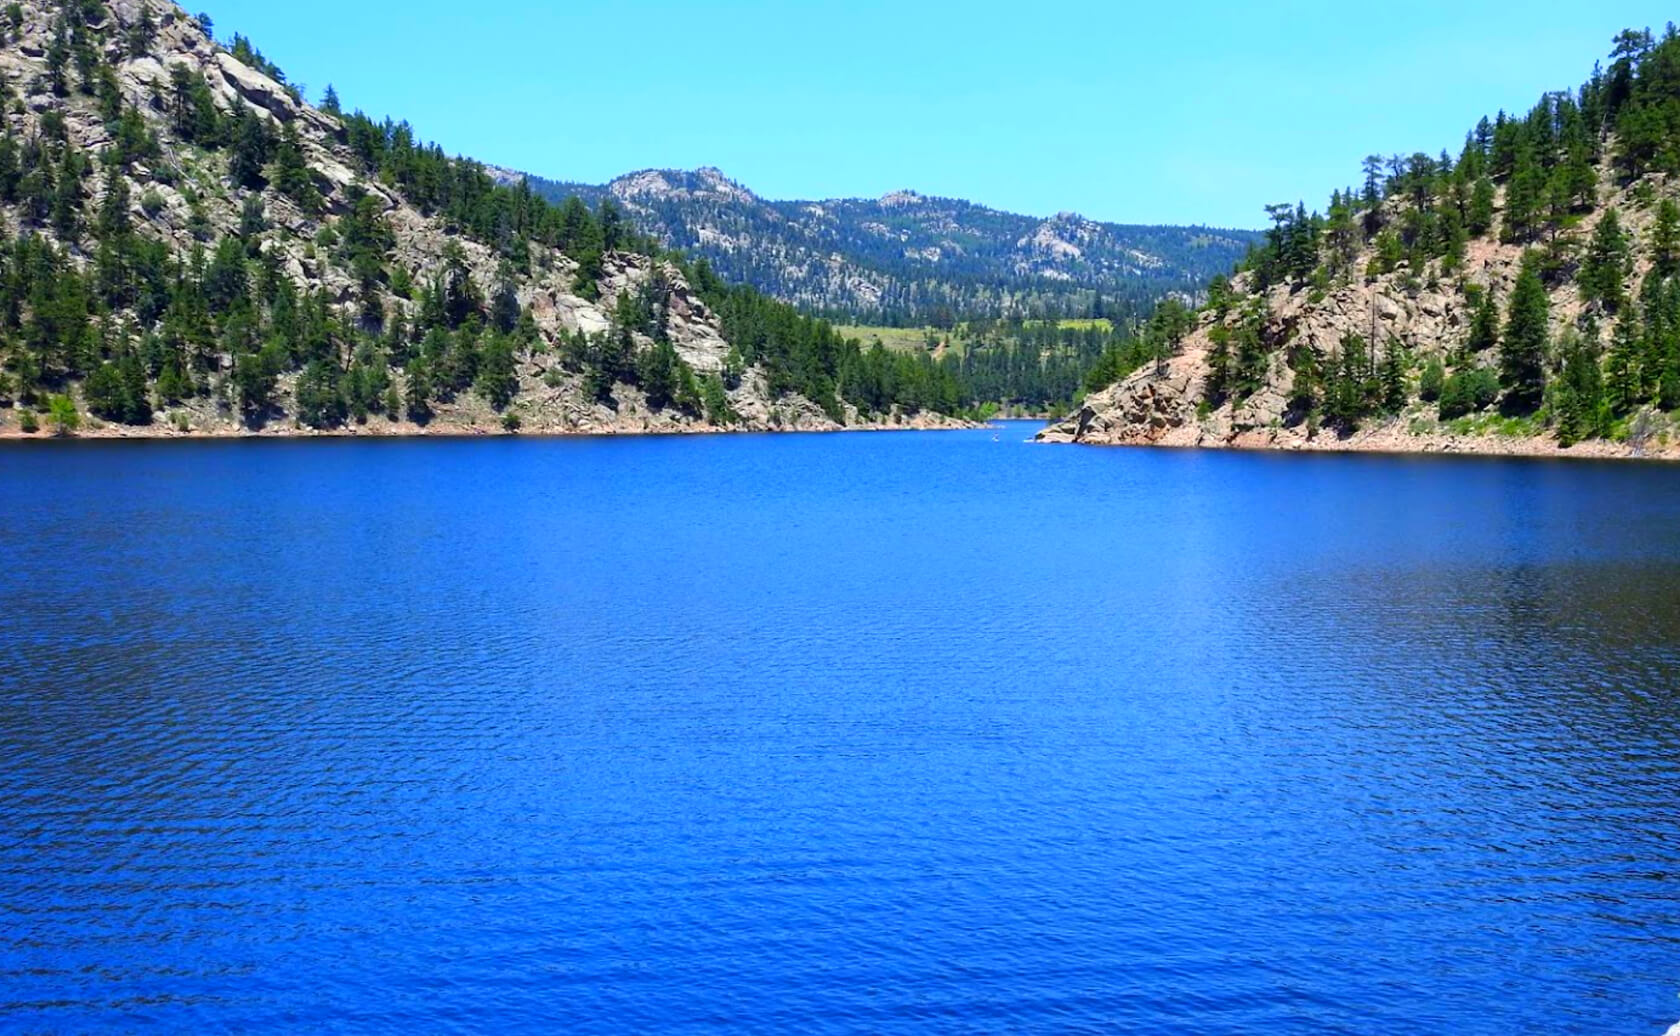 Gross-Lake-Fishing-Guide-Report-Colorado-01